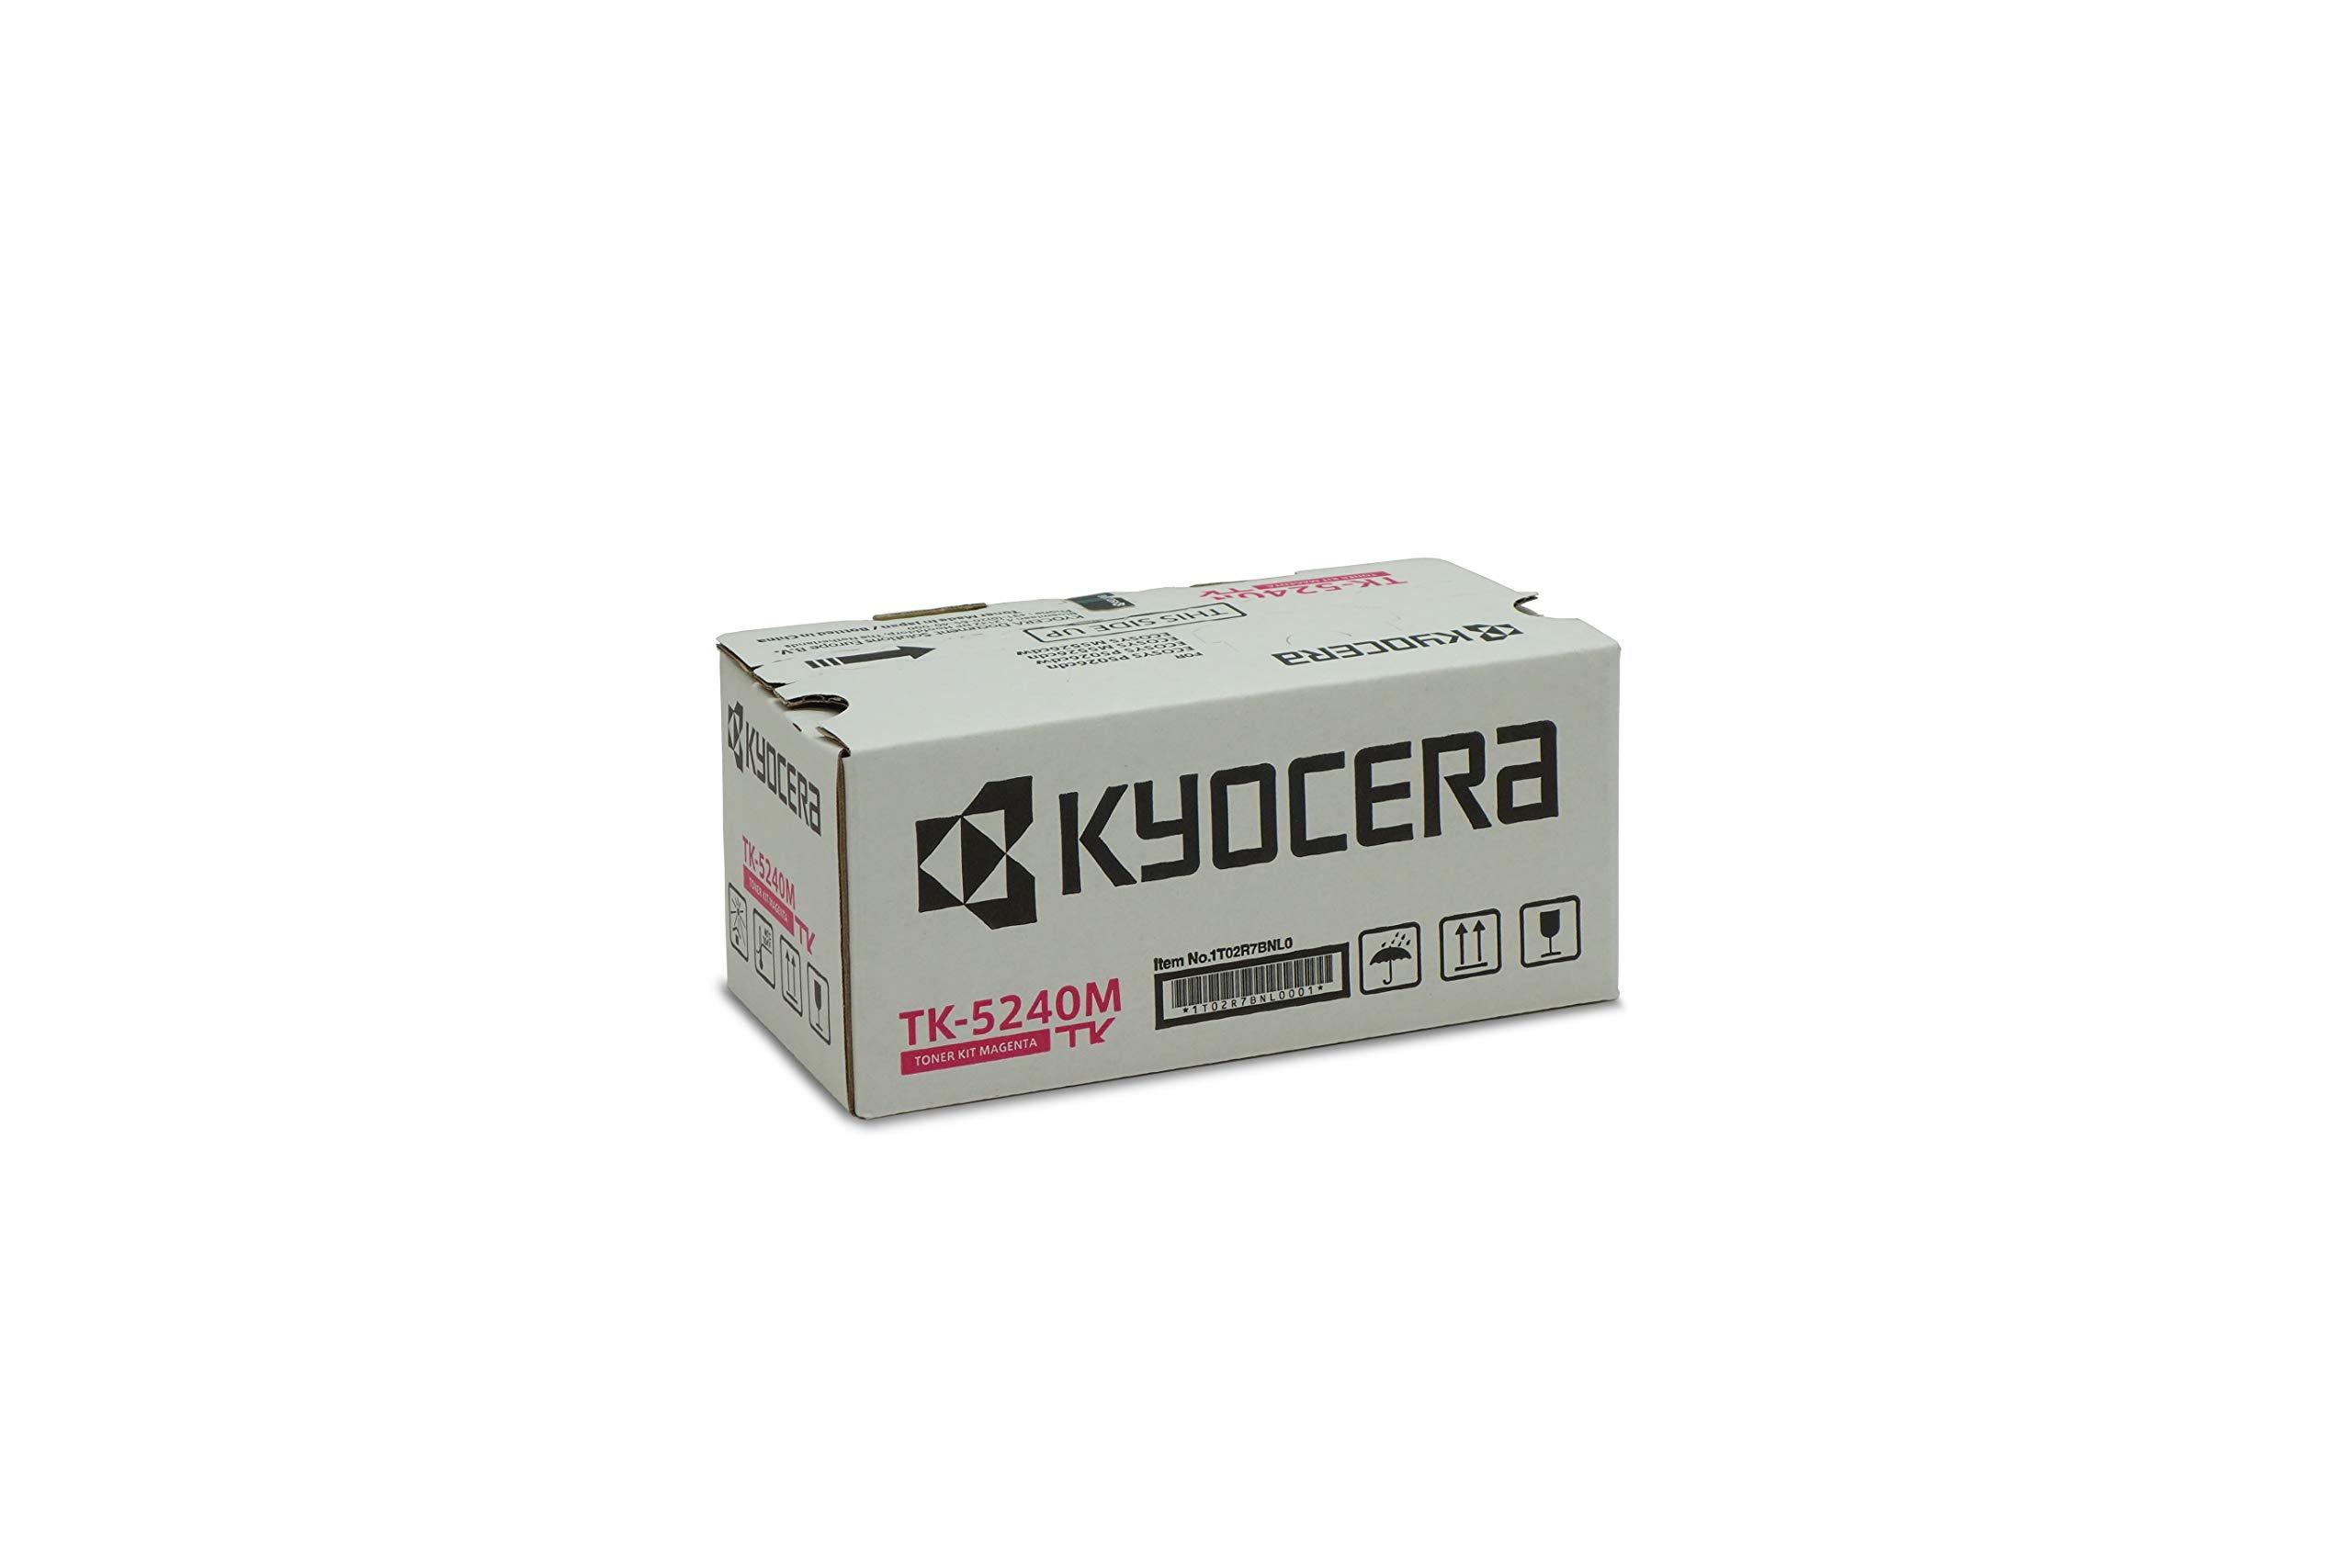 Kyocera-TK-5240C-Toner-Kartusche-Cyan-Originalkartusche-1T02R7CNL0